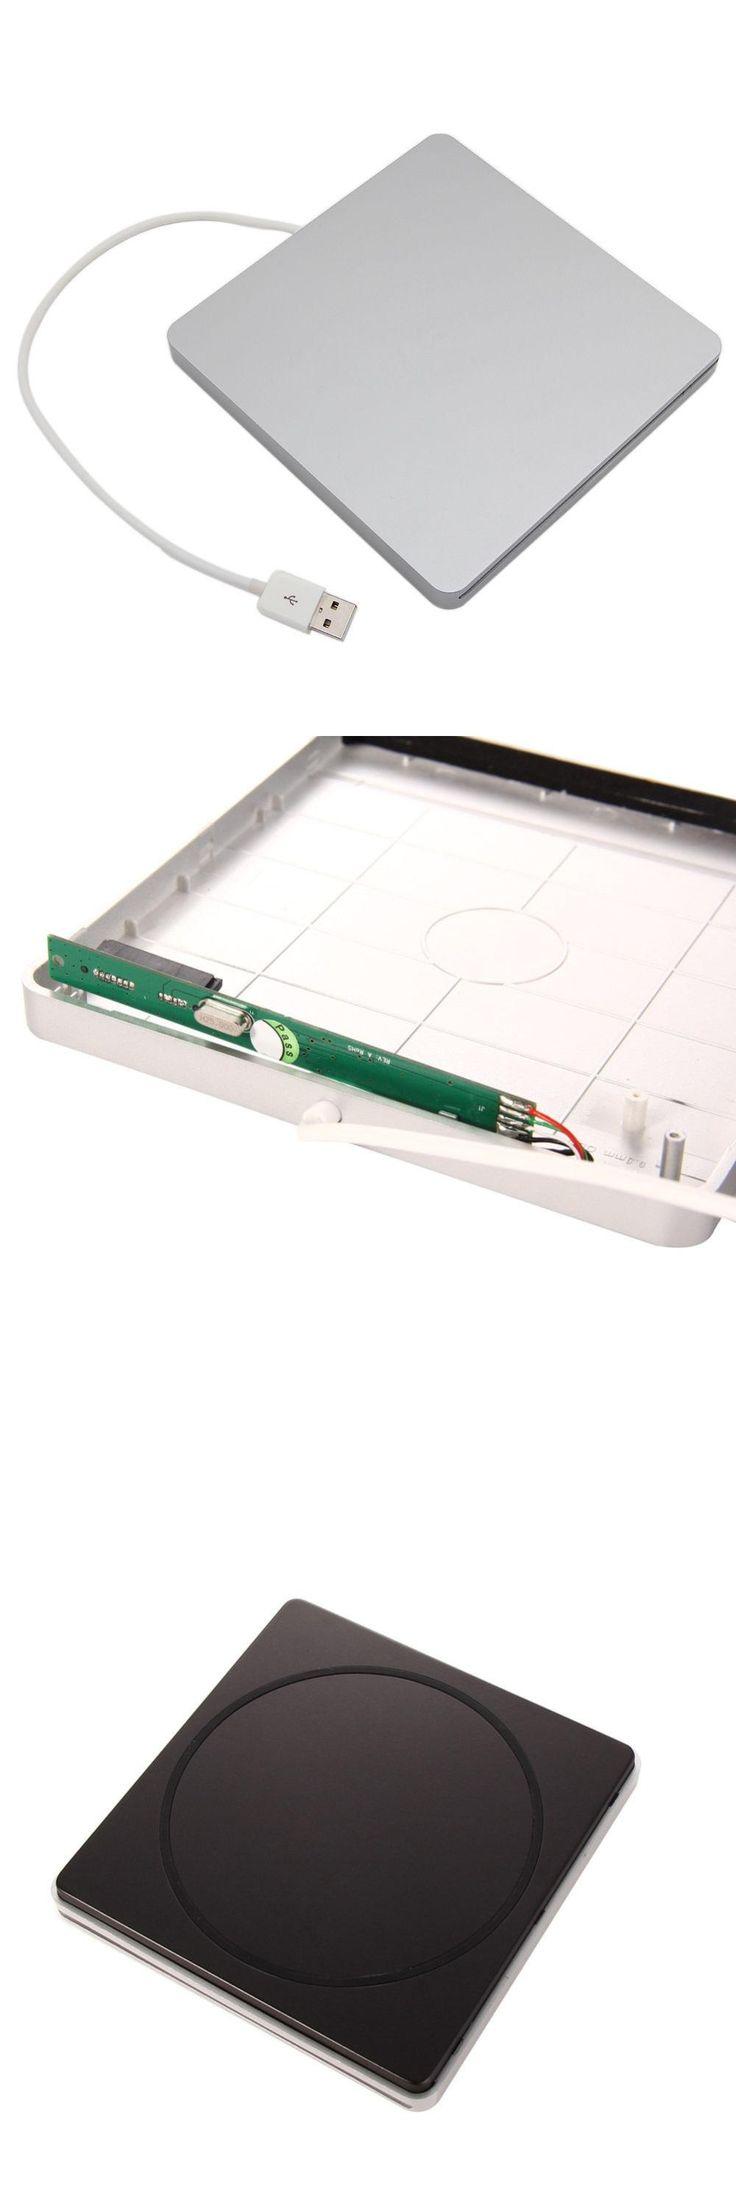 [Visit to Buy] USB External DVD Drive Burner Case for MacBook Air Pro iMac Mac mini Superdrive #Advertisement